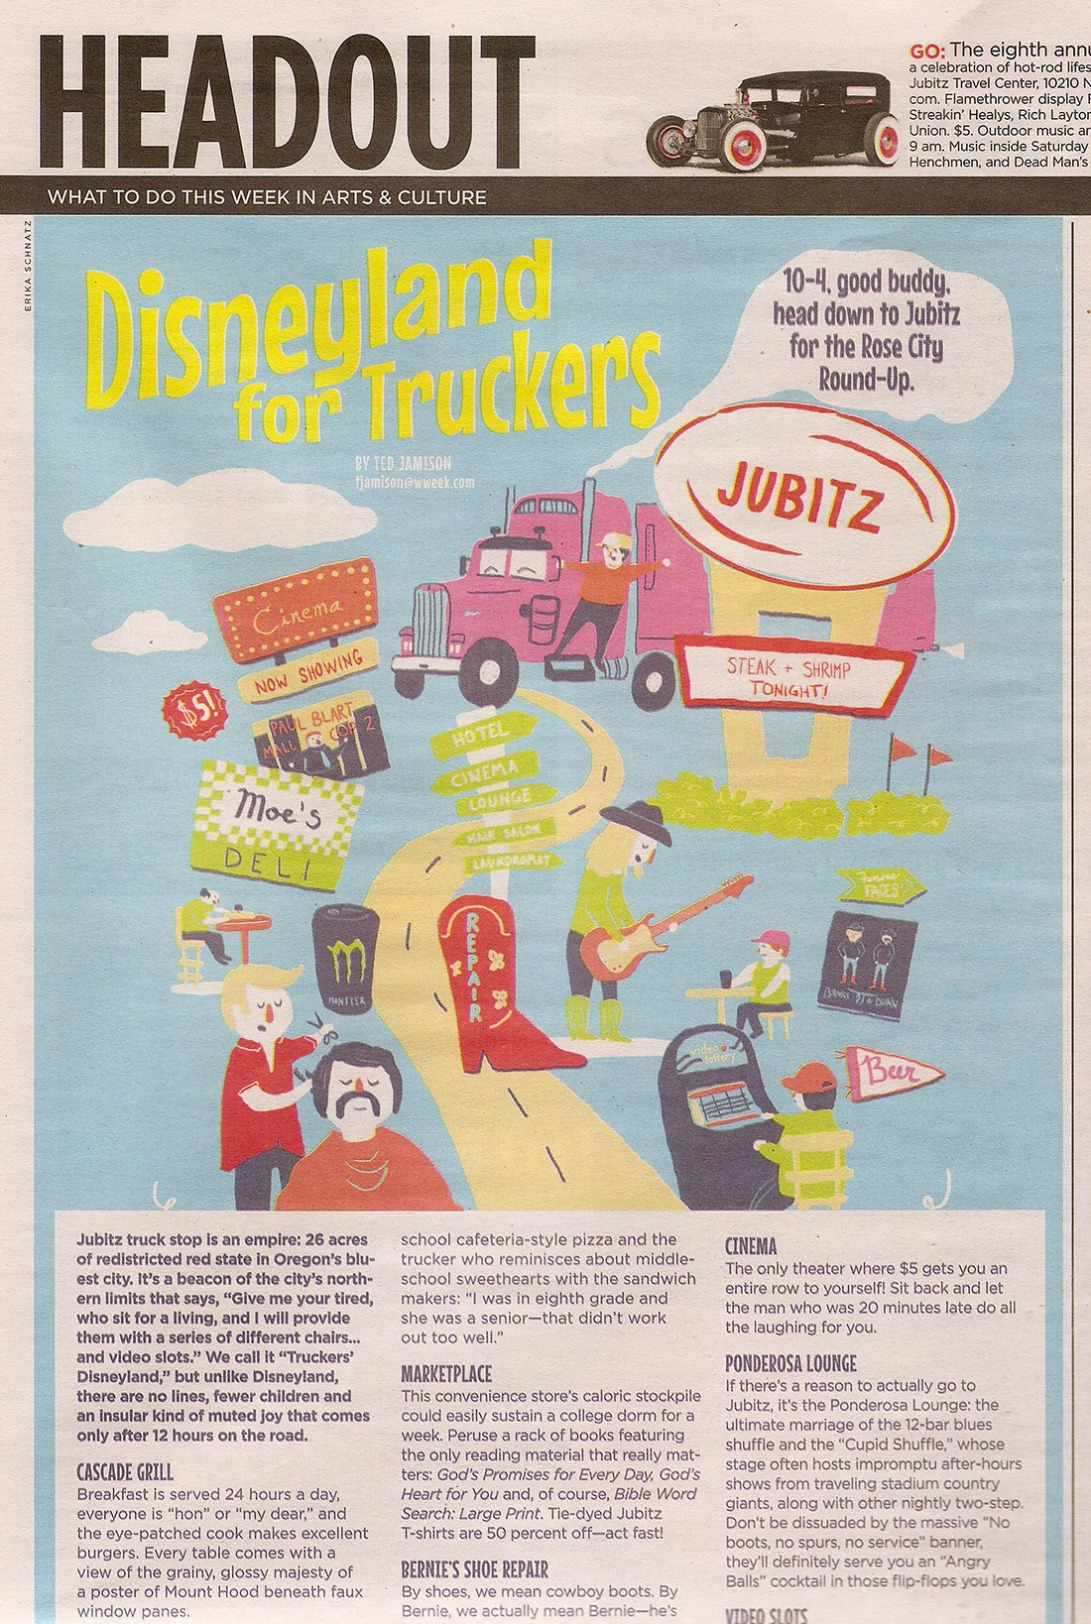 Disneyland for Truckers in print Erika Schnatz